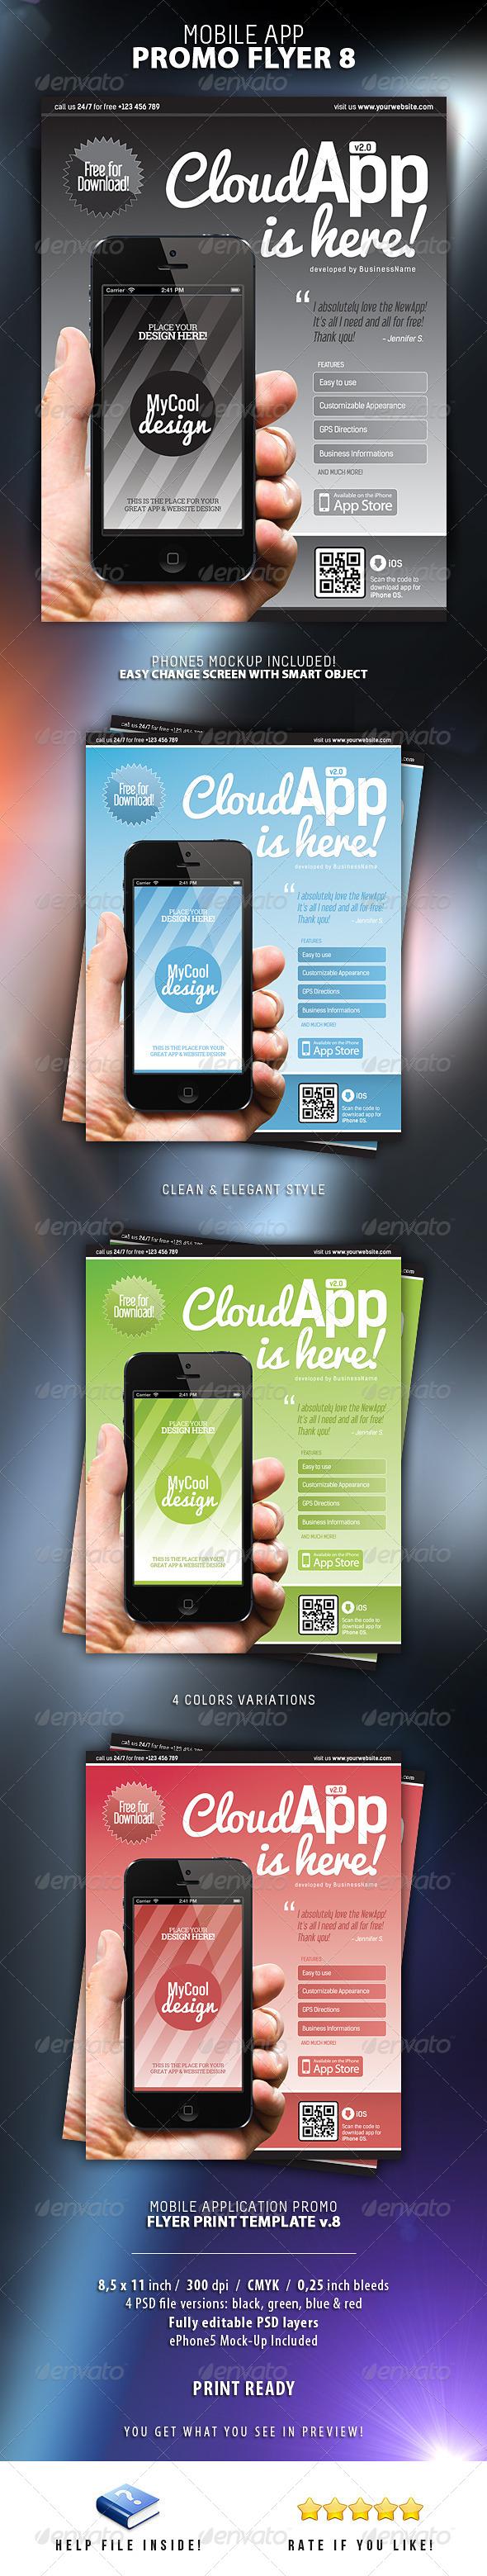 Mobile App Flyers 8 - Commerce Flyers